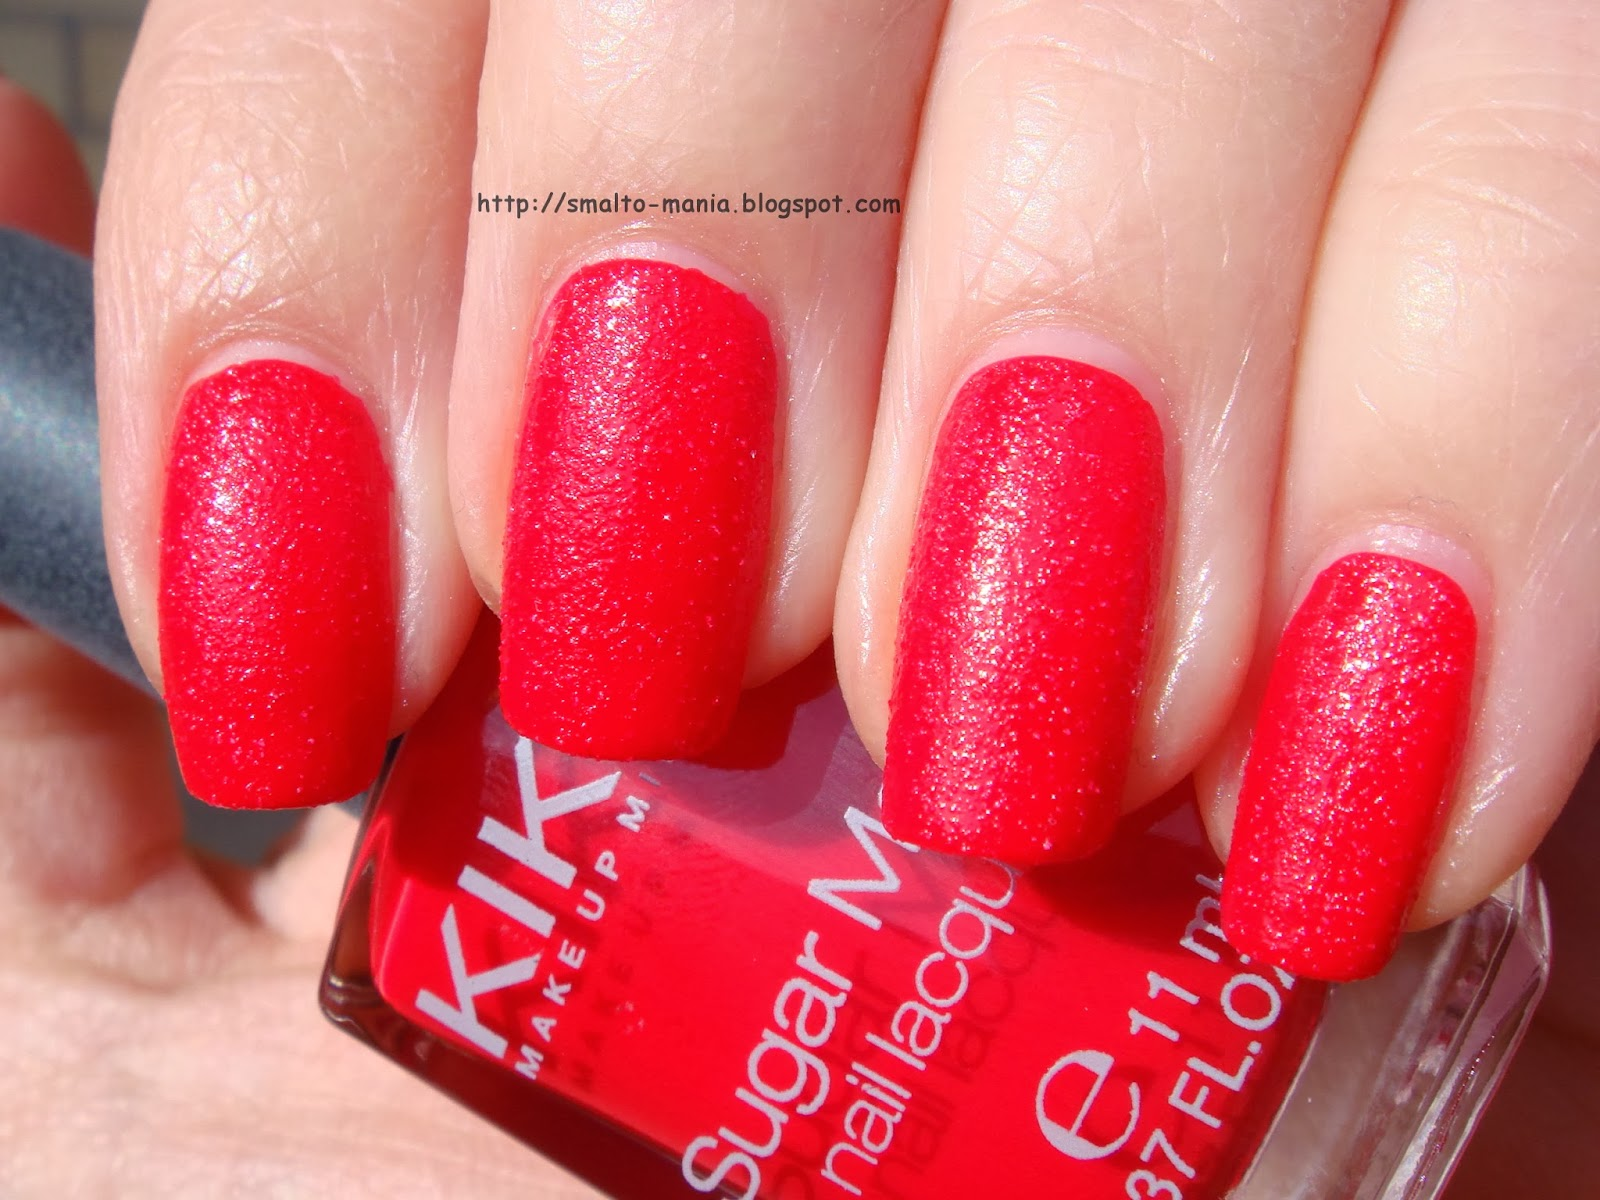 Kiko Sugar Mat n.632 Rosso